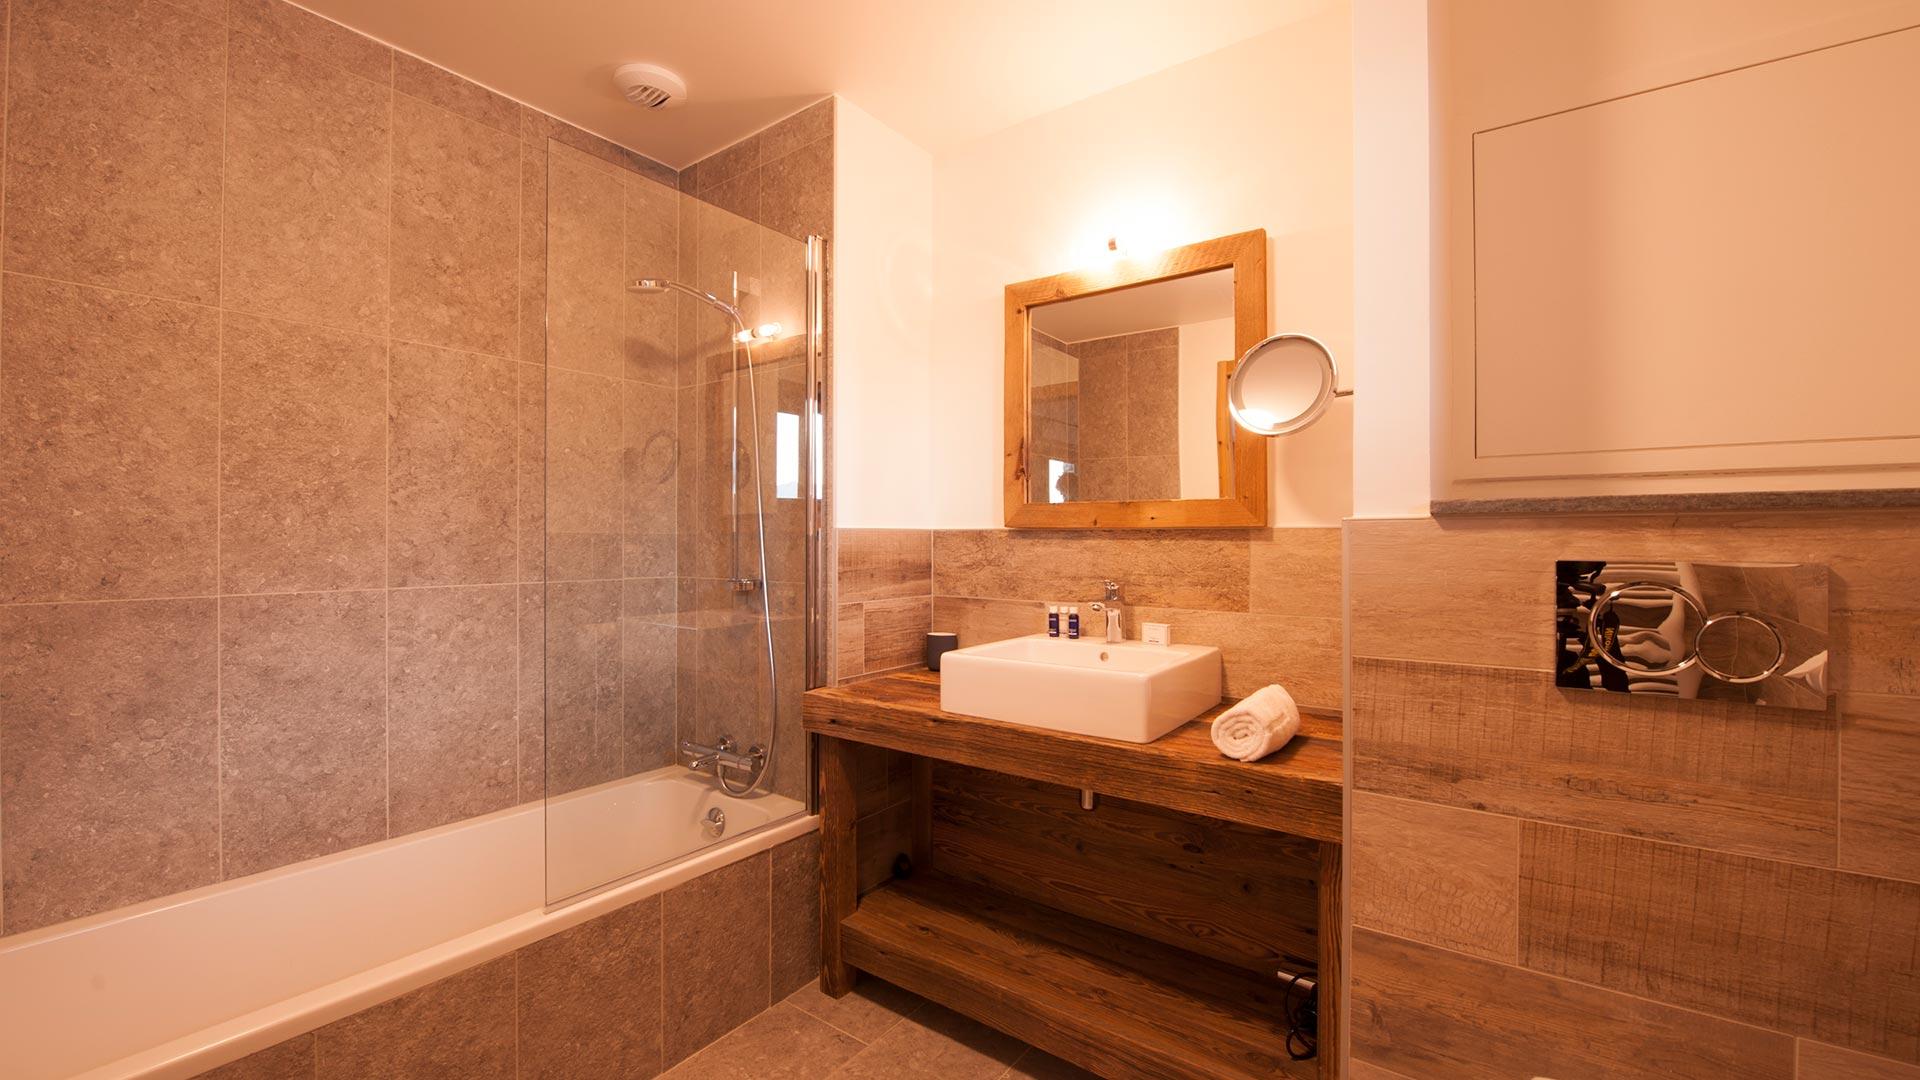 Ensuite bathroom bedroom 1 in Luxury self-catered chalet Latour in Sainte Foy